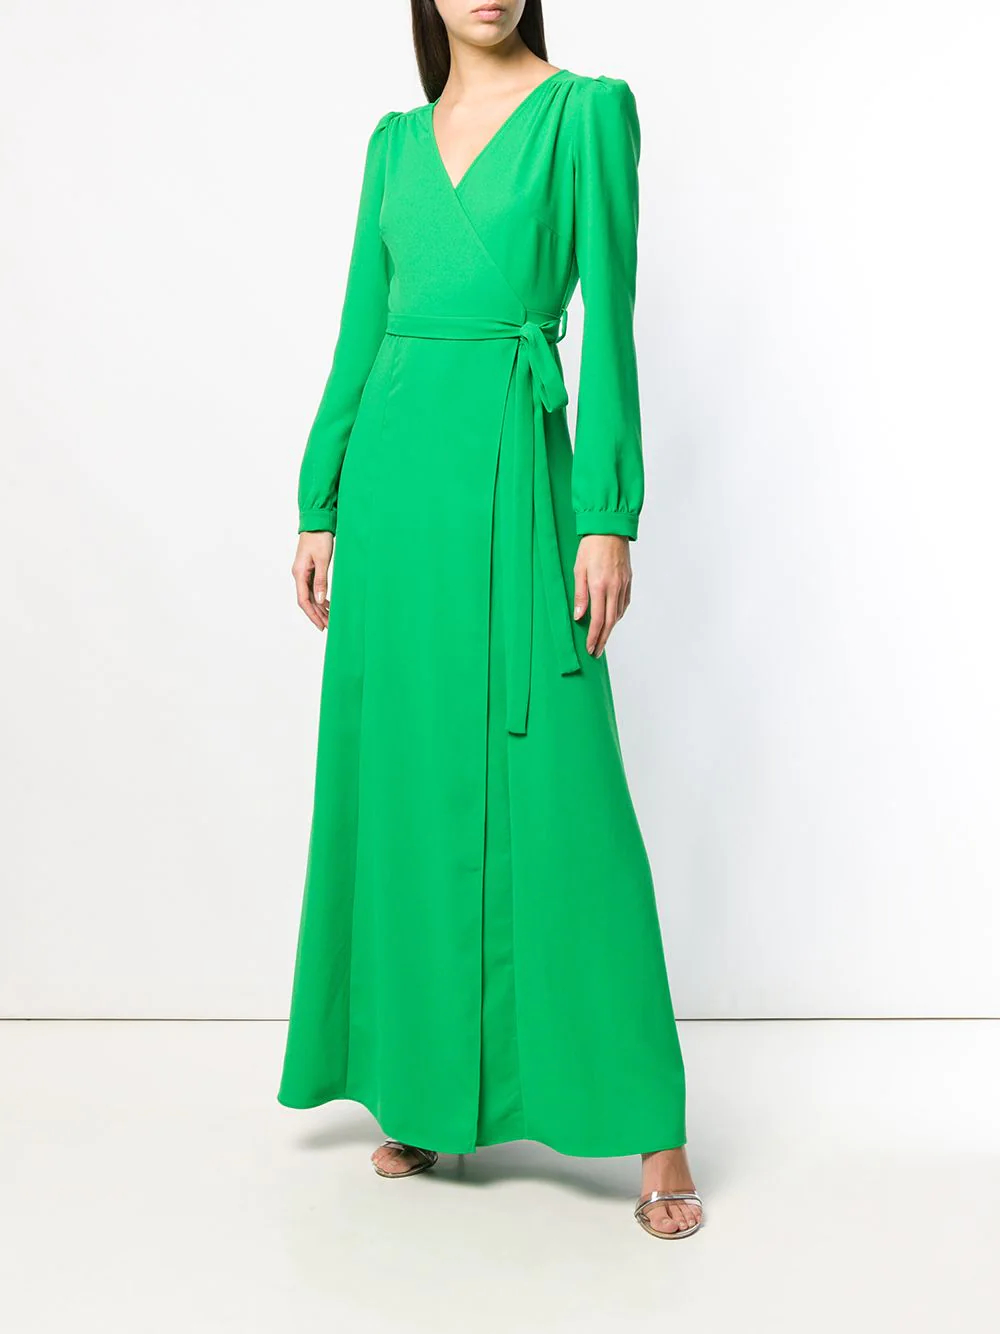 P.A.R.O.S.H. | платье-макси с запахом | Clouty